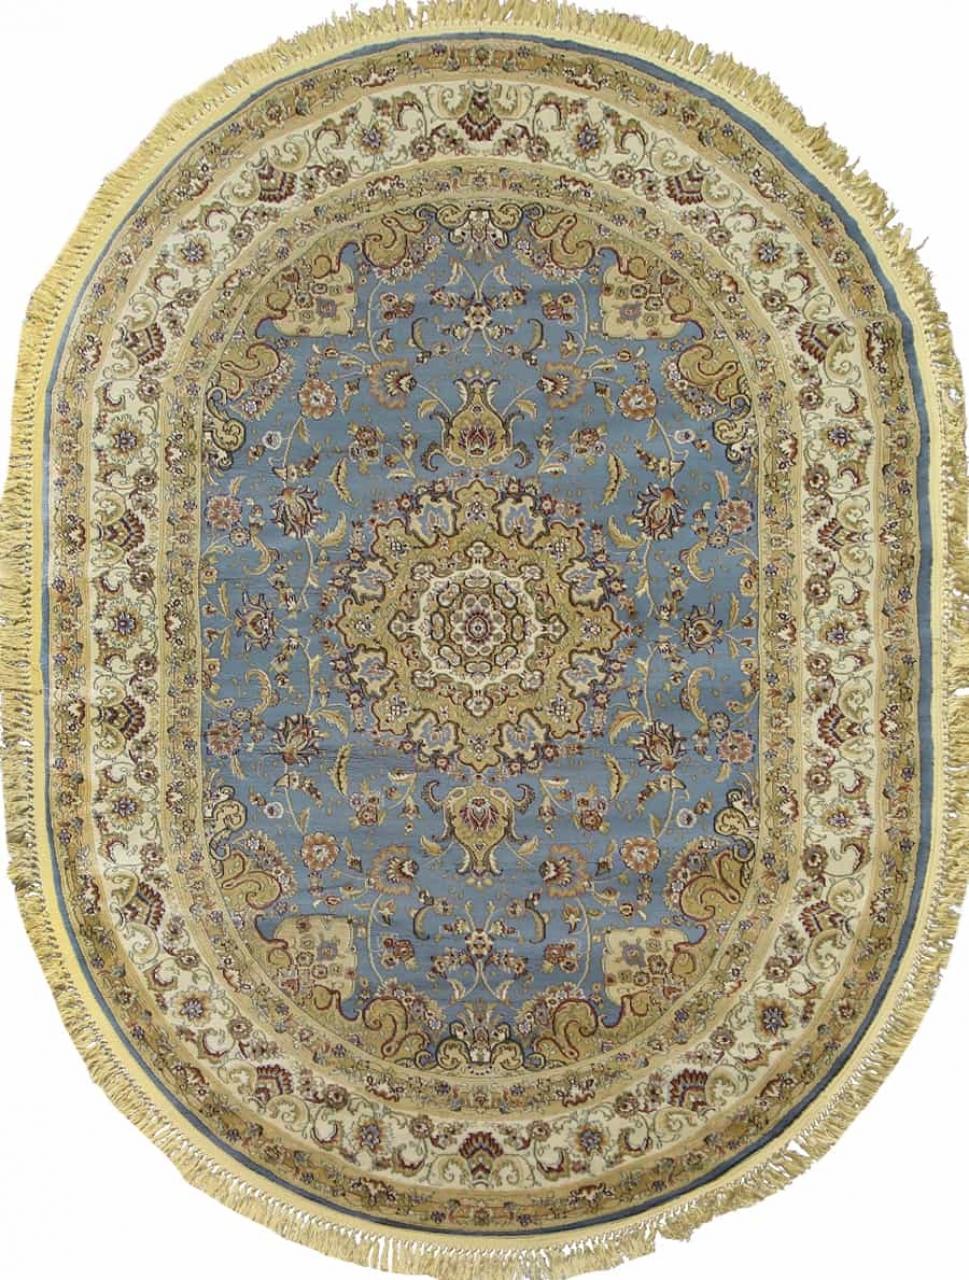 Ковер d158 - BLUE - Овал - коллекция BUHARA - фото 2